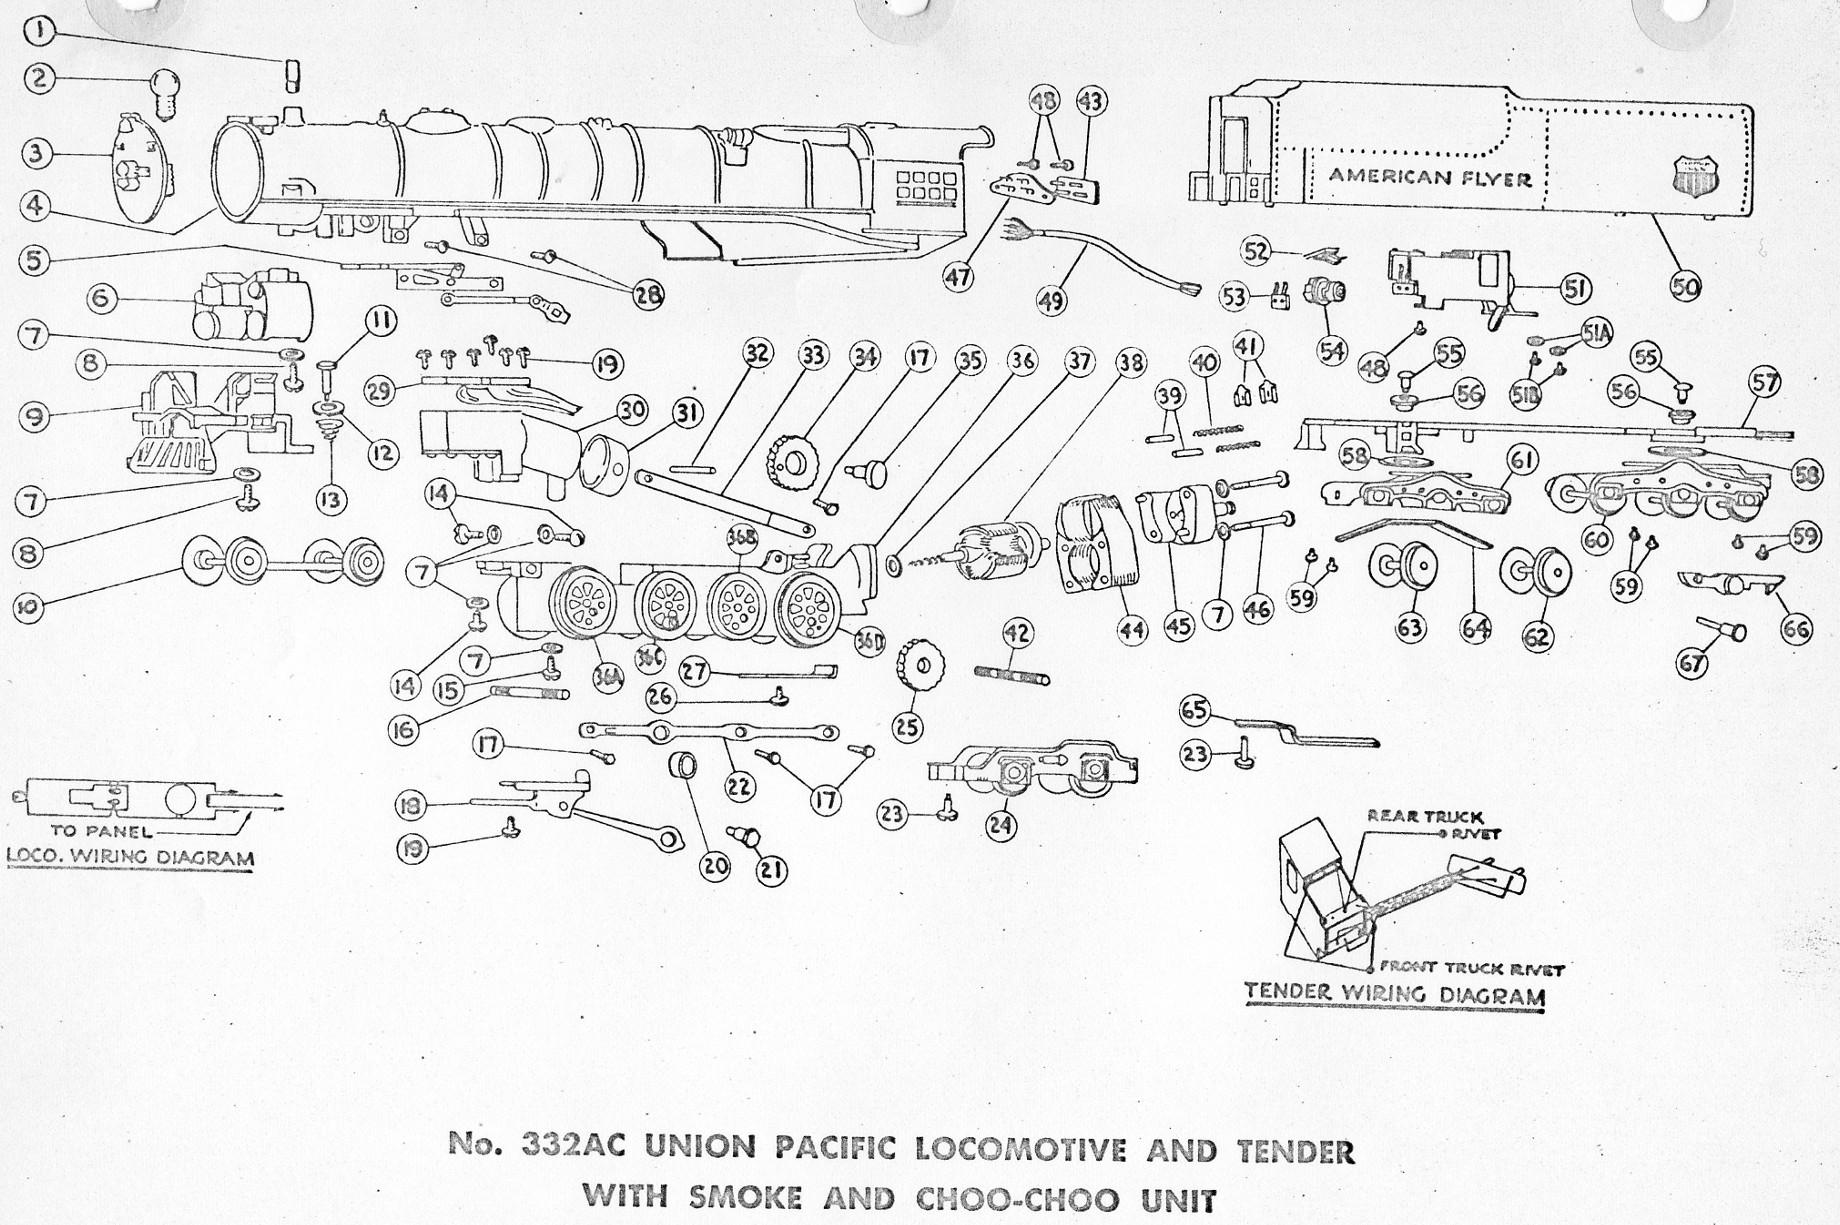 American Flyer Locomotive 332ac Parts List Amp Diagram